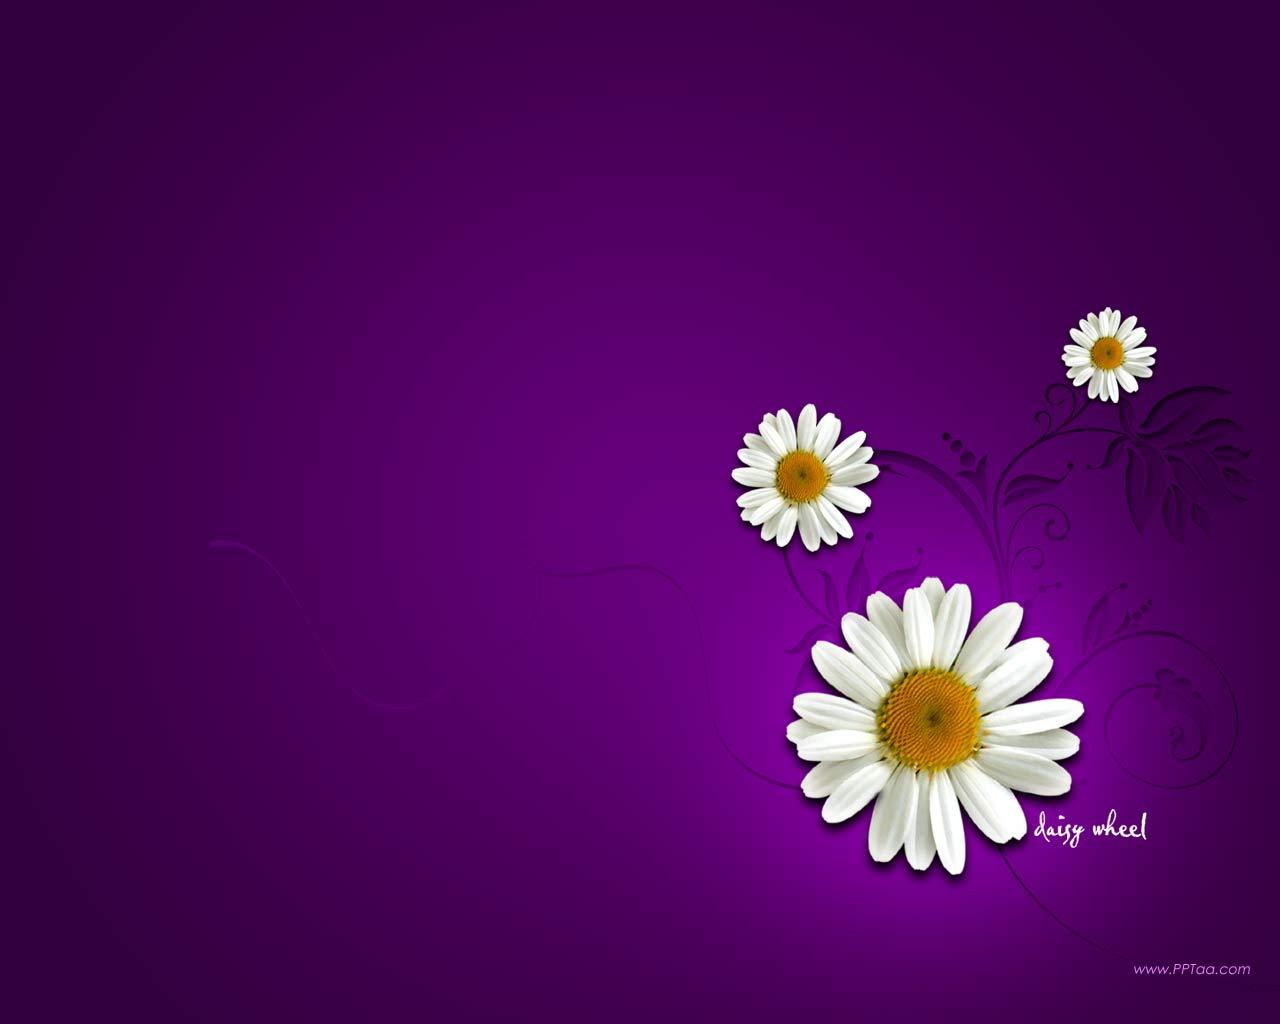 Daisy Flower Wallpaper WallpaperSafari